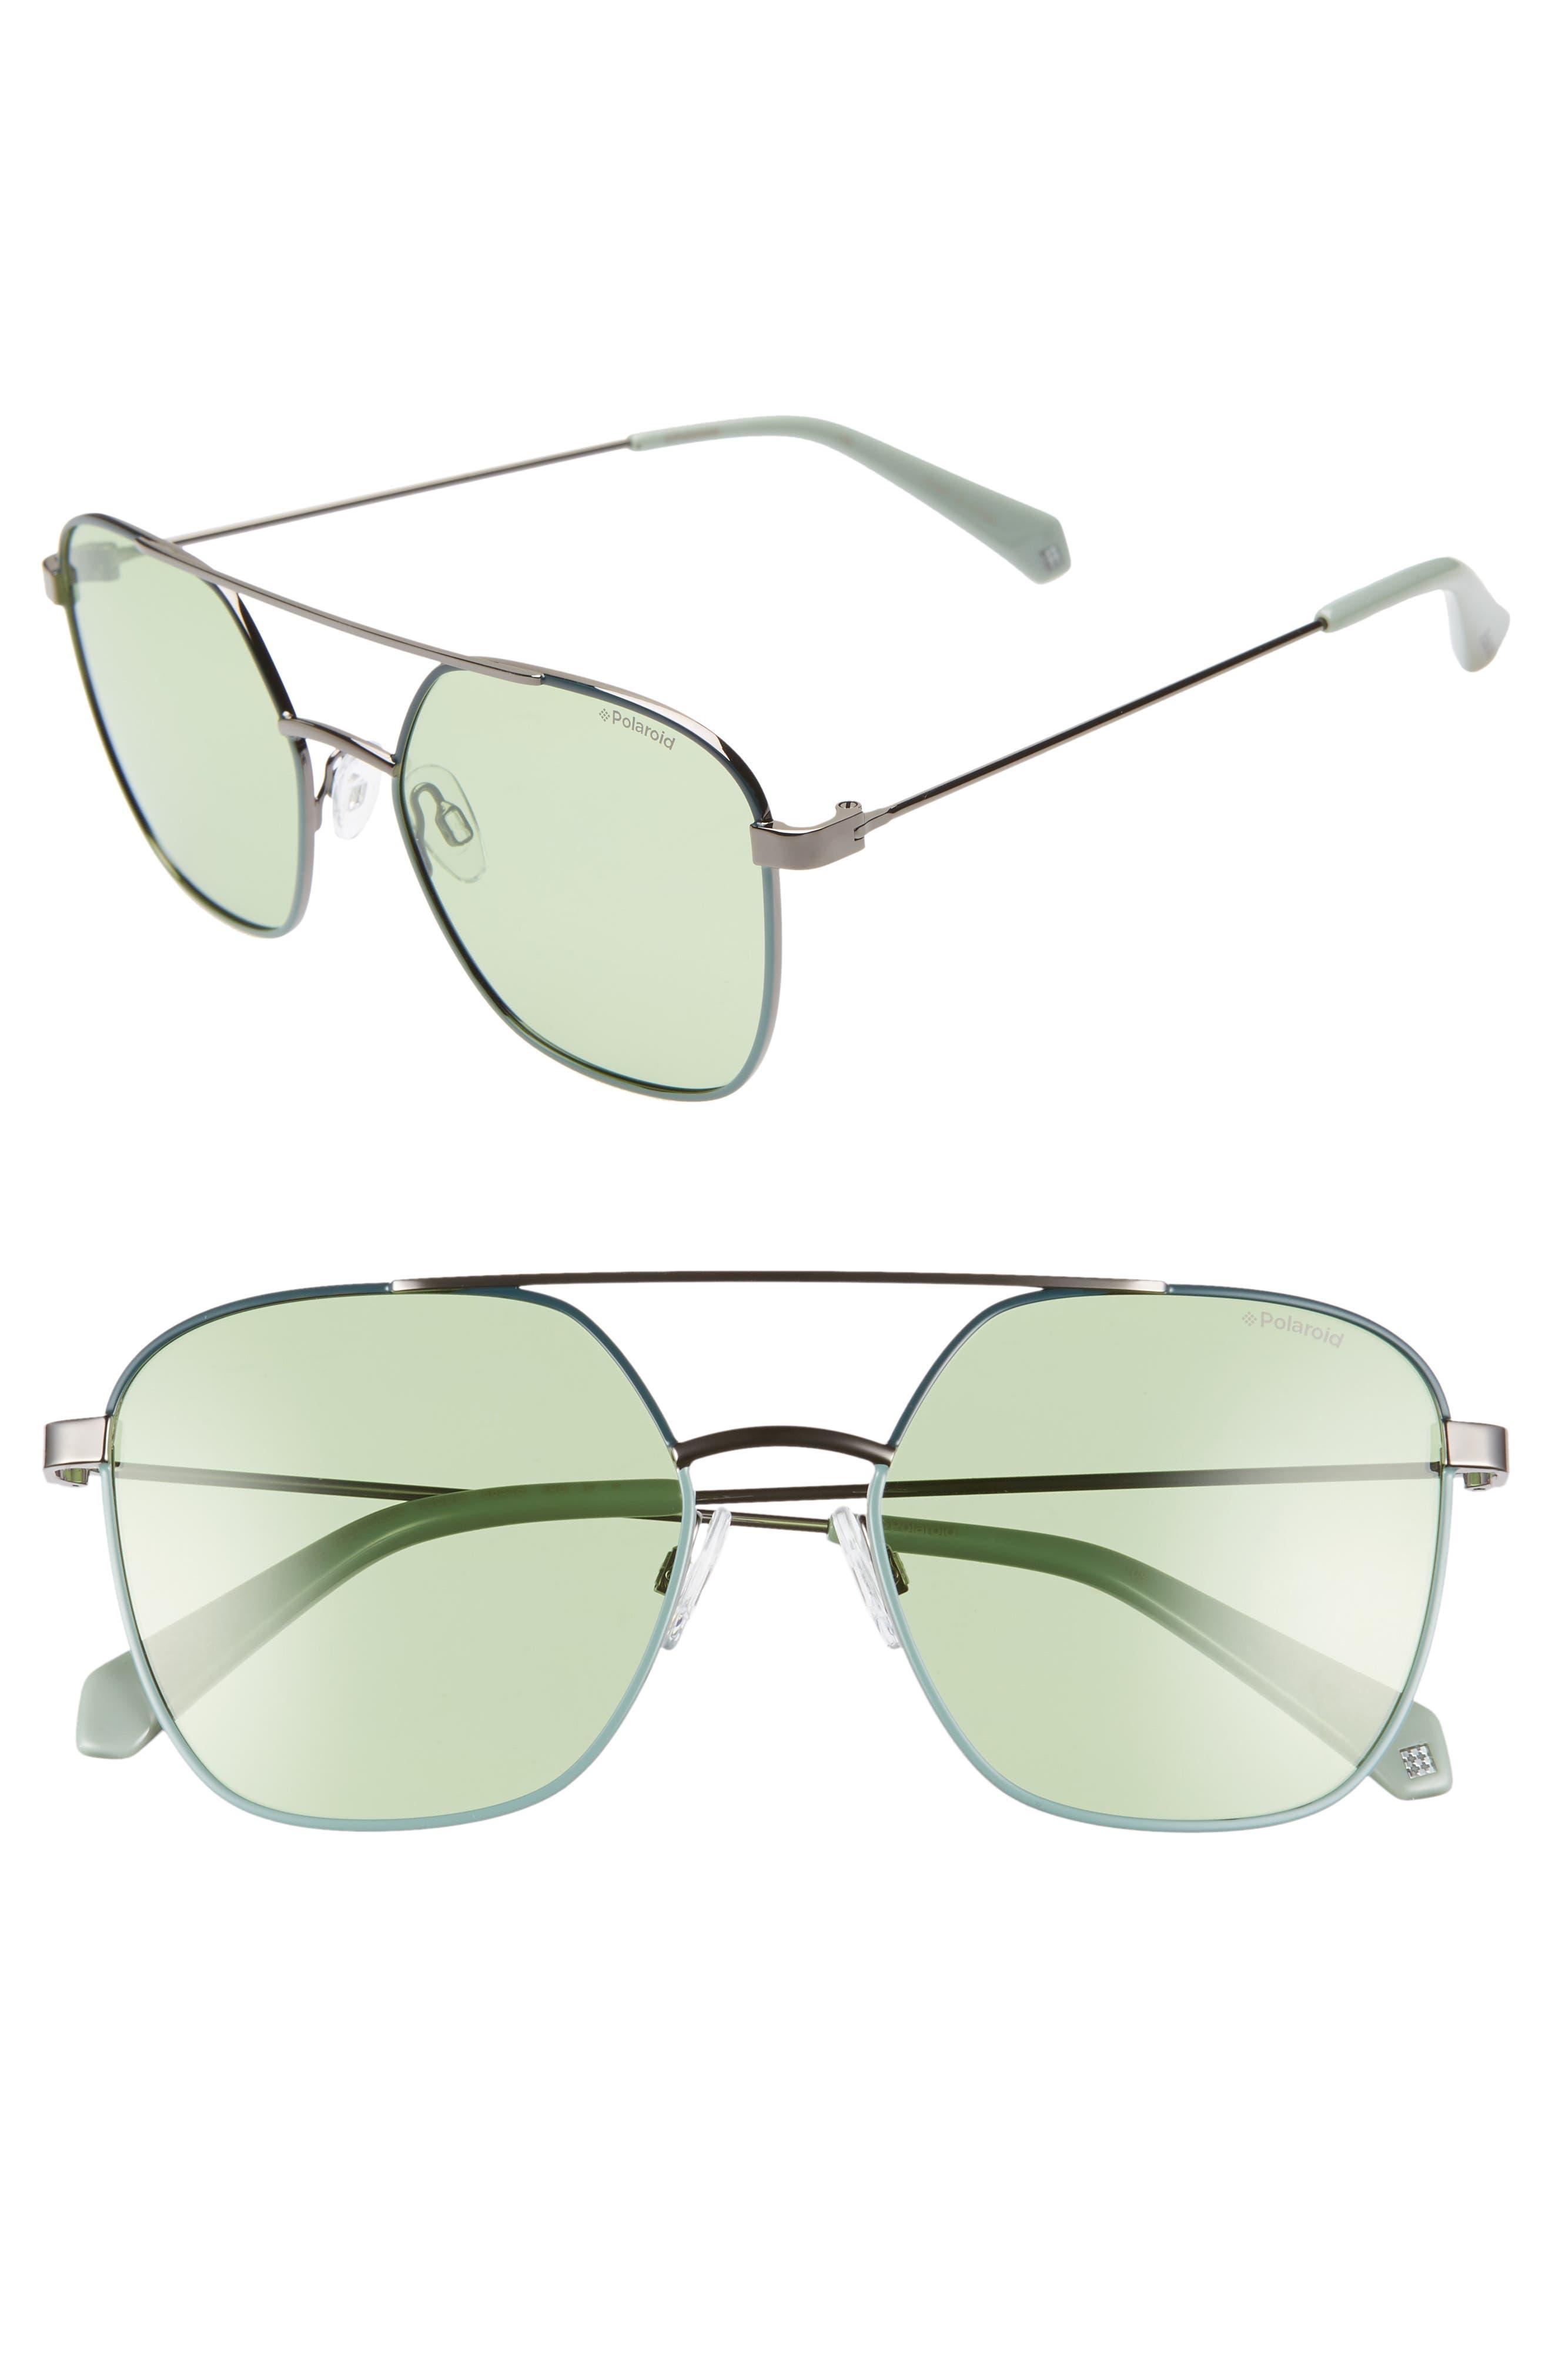 Polaroid 5m Polarized Square Aviator Sunglasses - Green